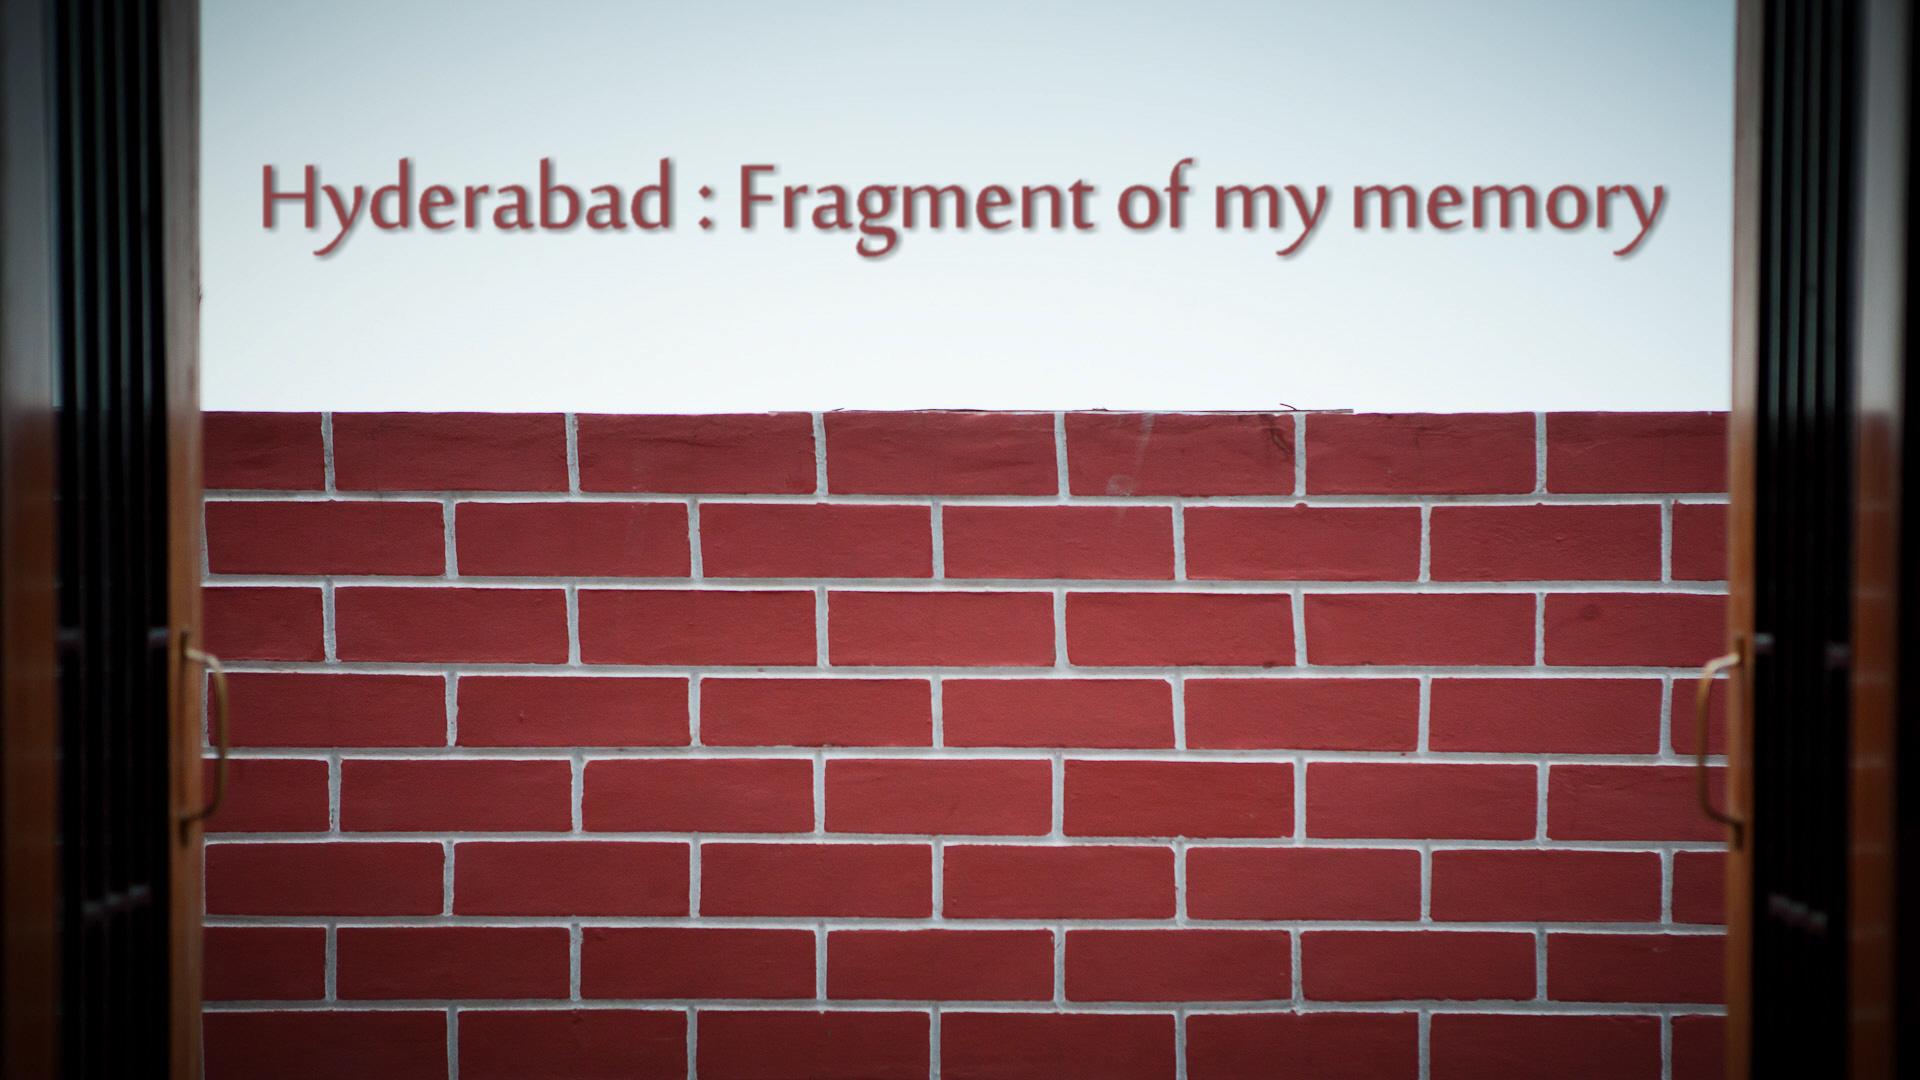 Hyderabad: Fragment of my memory